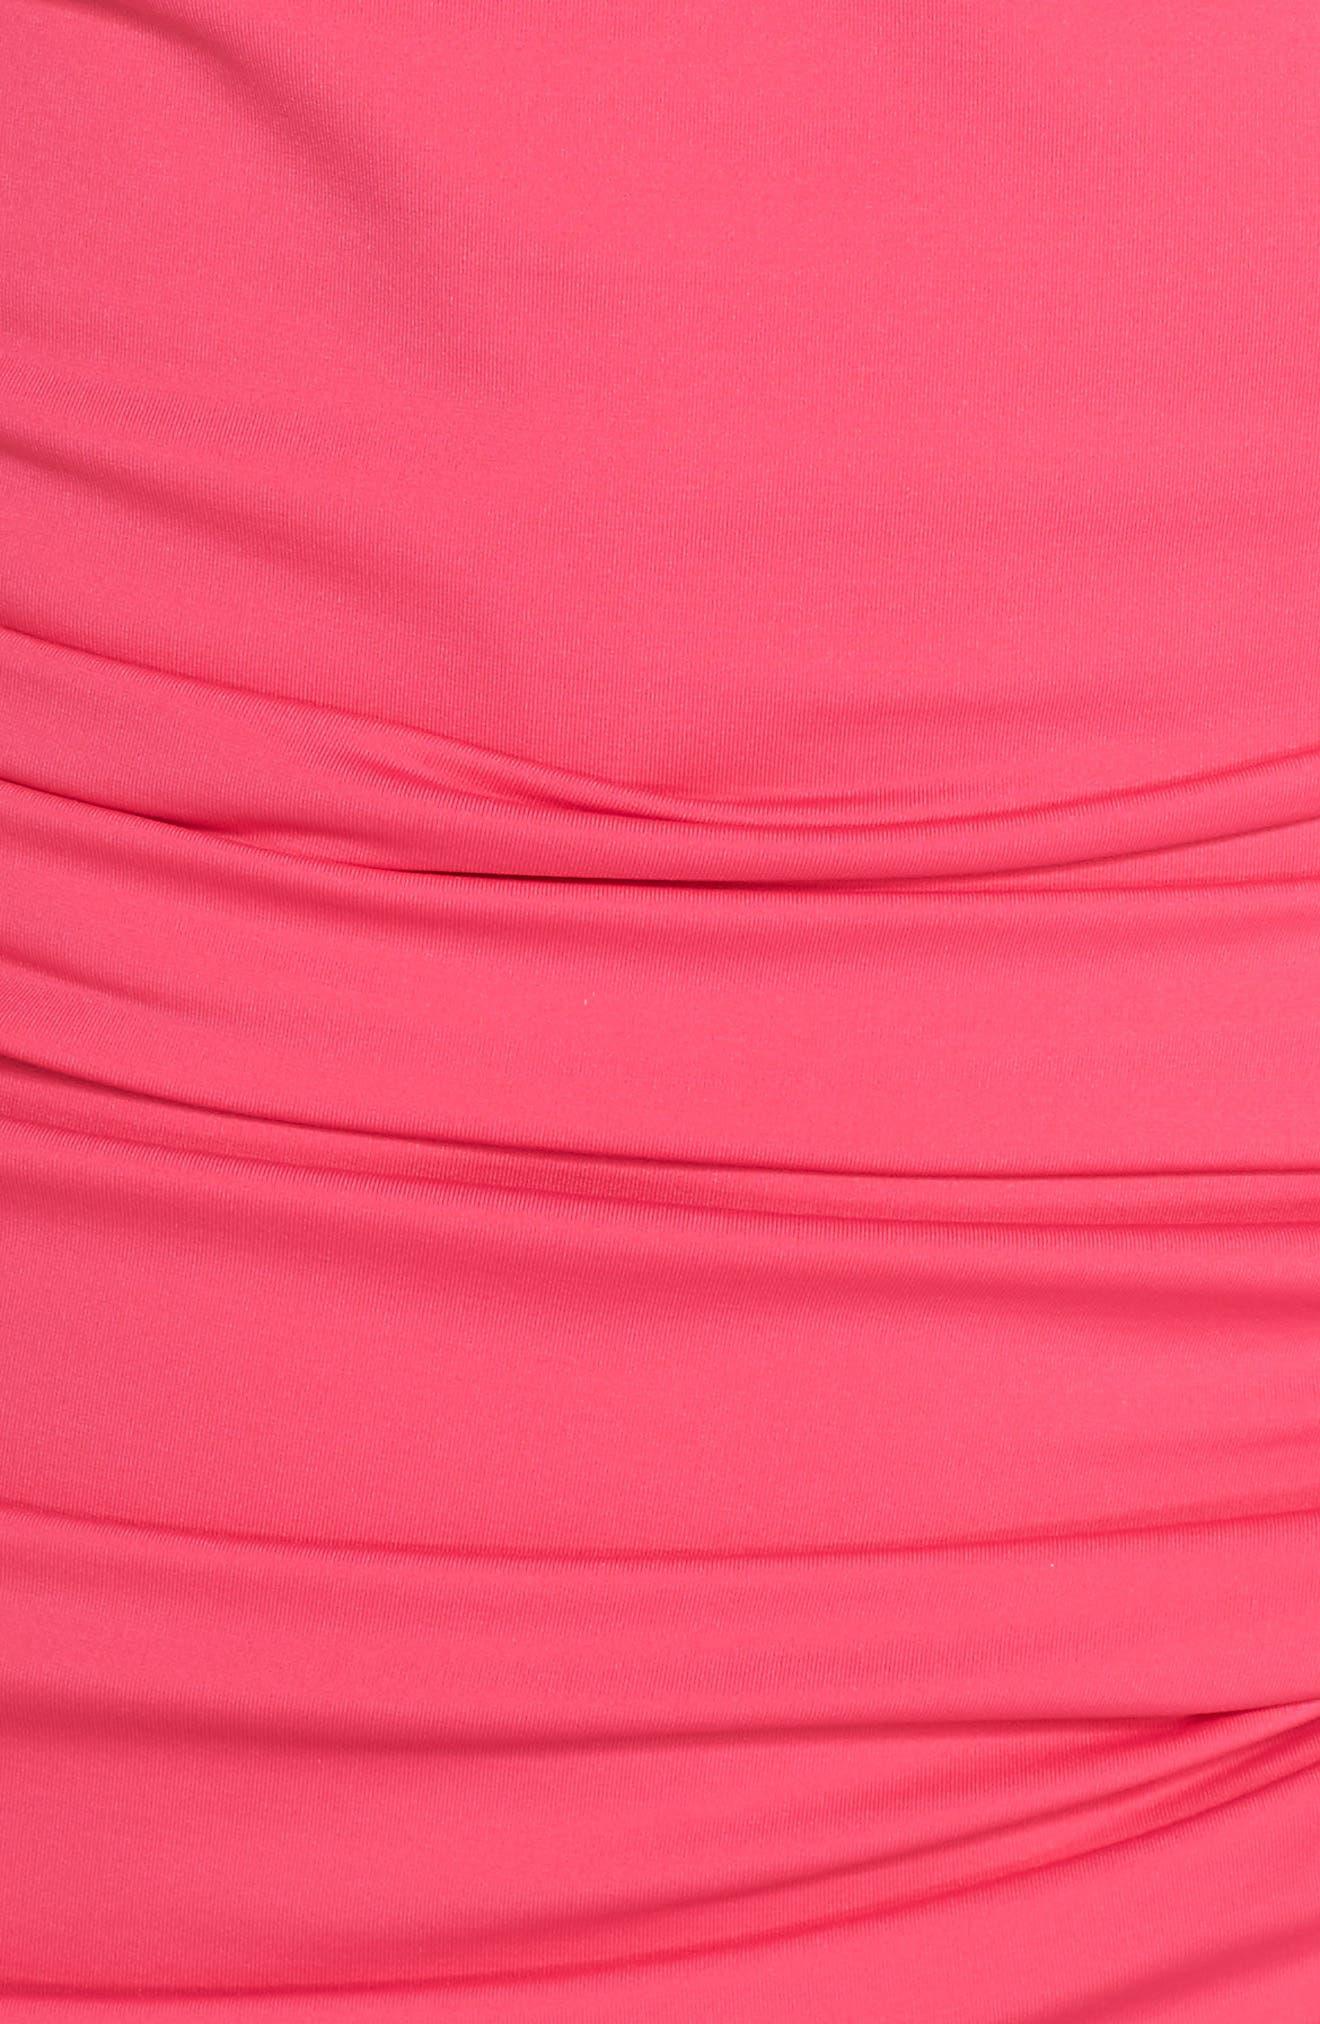 Pearl Shirred Long Tankini Top,                             Alternate thumbnail 5, color,                             Bright Fuchsia